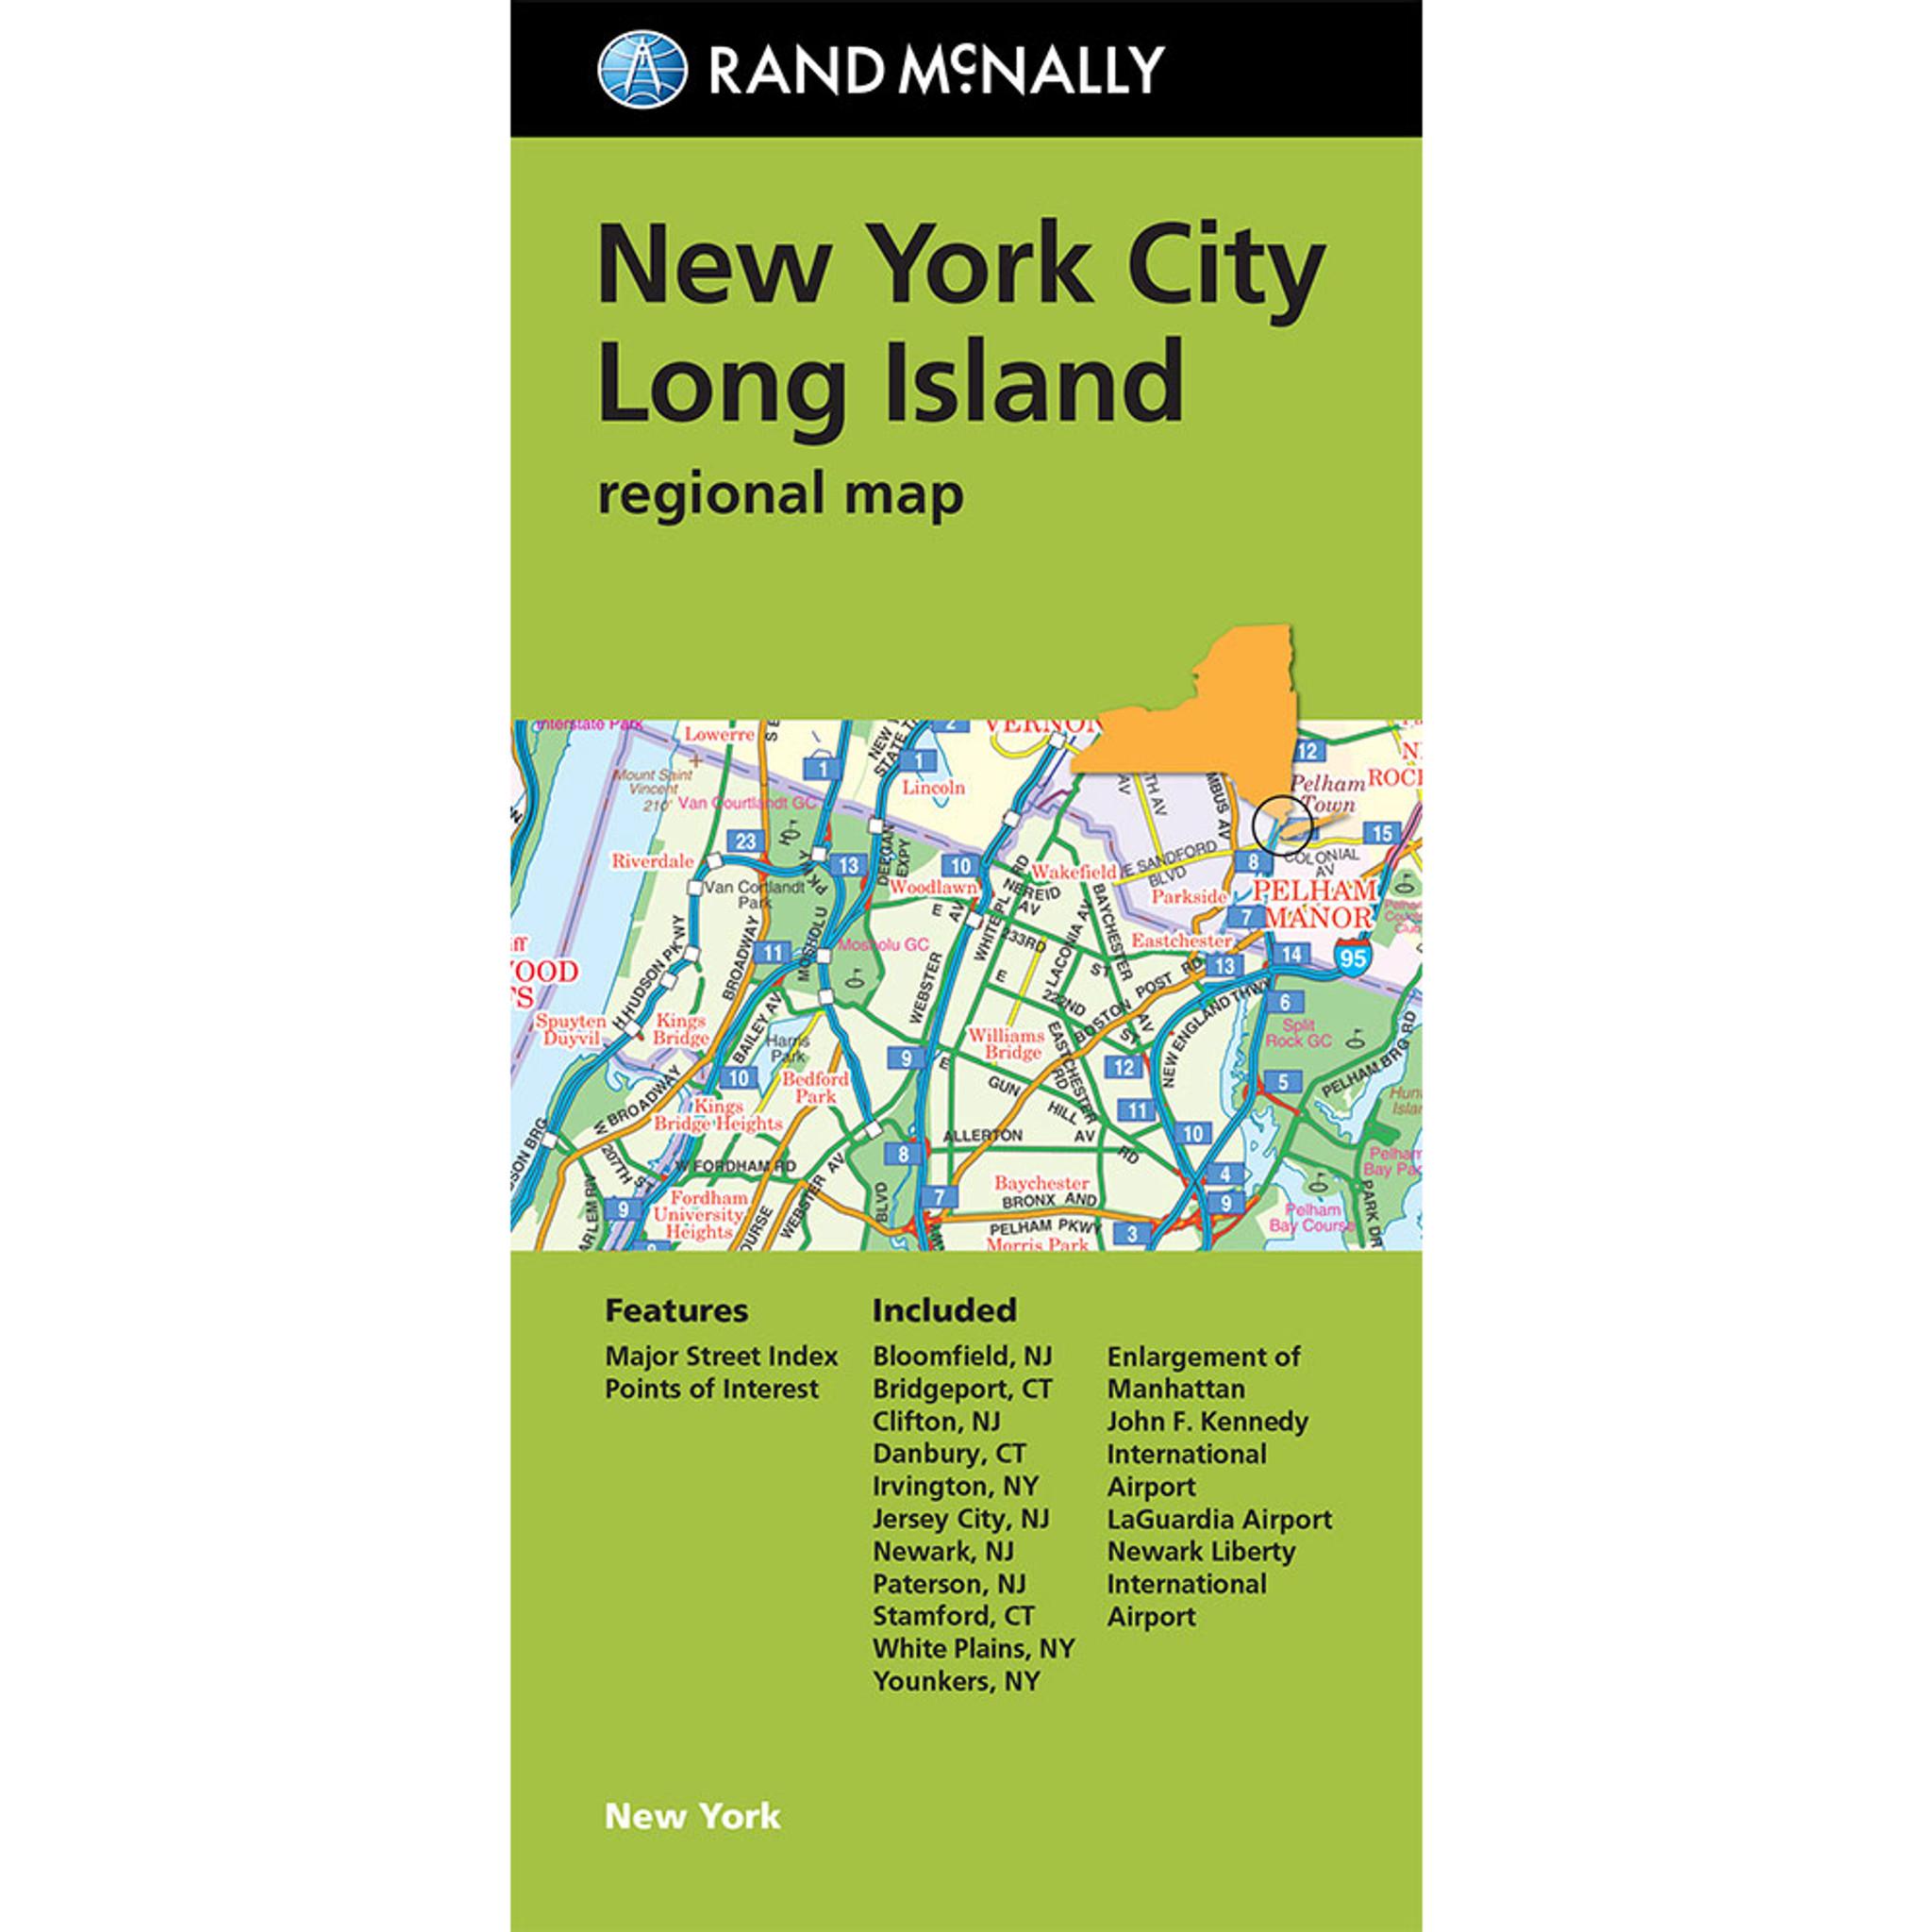 Folded Map: New York City Long Island Regional Map on the bronx, long island map showing towns, suffolk county long island map, long island wantagh, antique long island map, long island herricks, new york map, new york city, nassau county, long island rail map, long island lirr map, washington dc map, long island buffalo, nassau county long island map, new york metropolitan area, suffolk county, long island new york, staten island, long island map view, long island sound, coney island, long island town names, long island bronx map, long island railroad map, long island connecticut map, times square, battle of long island, long beach, long island potato fields, long island boston map, ellis island, north shore long island map, hudson river, brooklyn bridge,